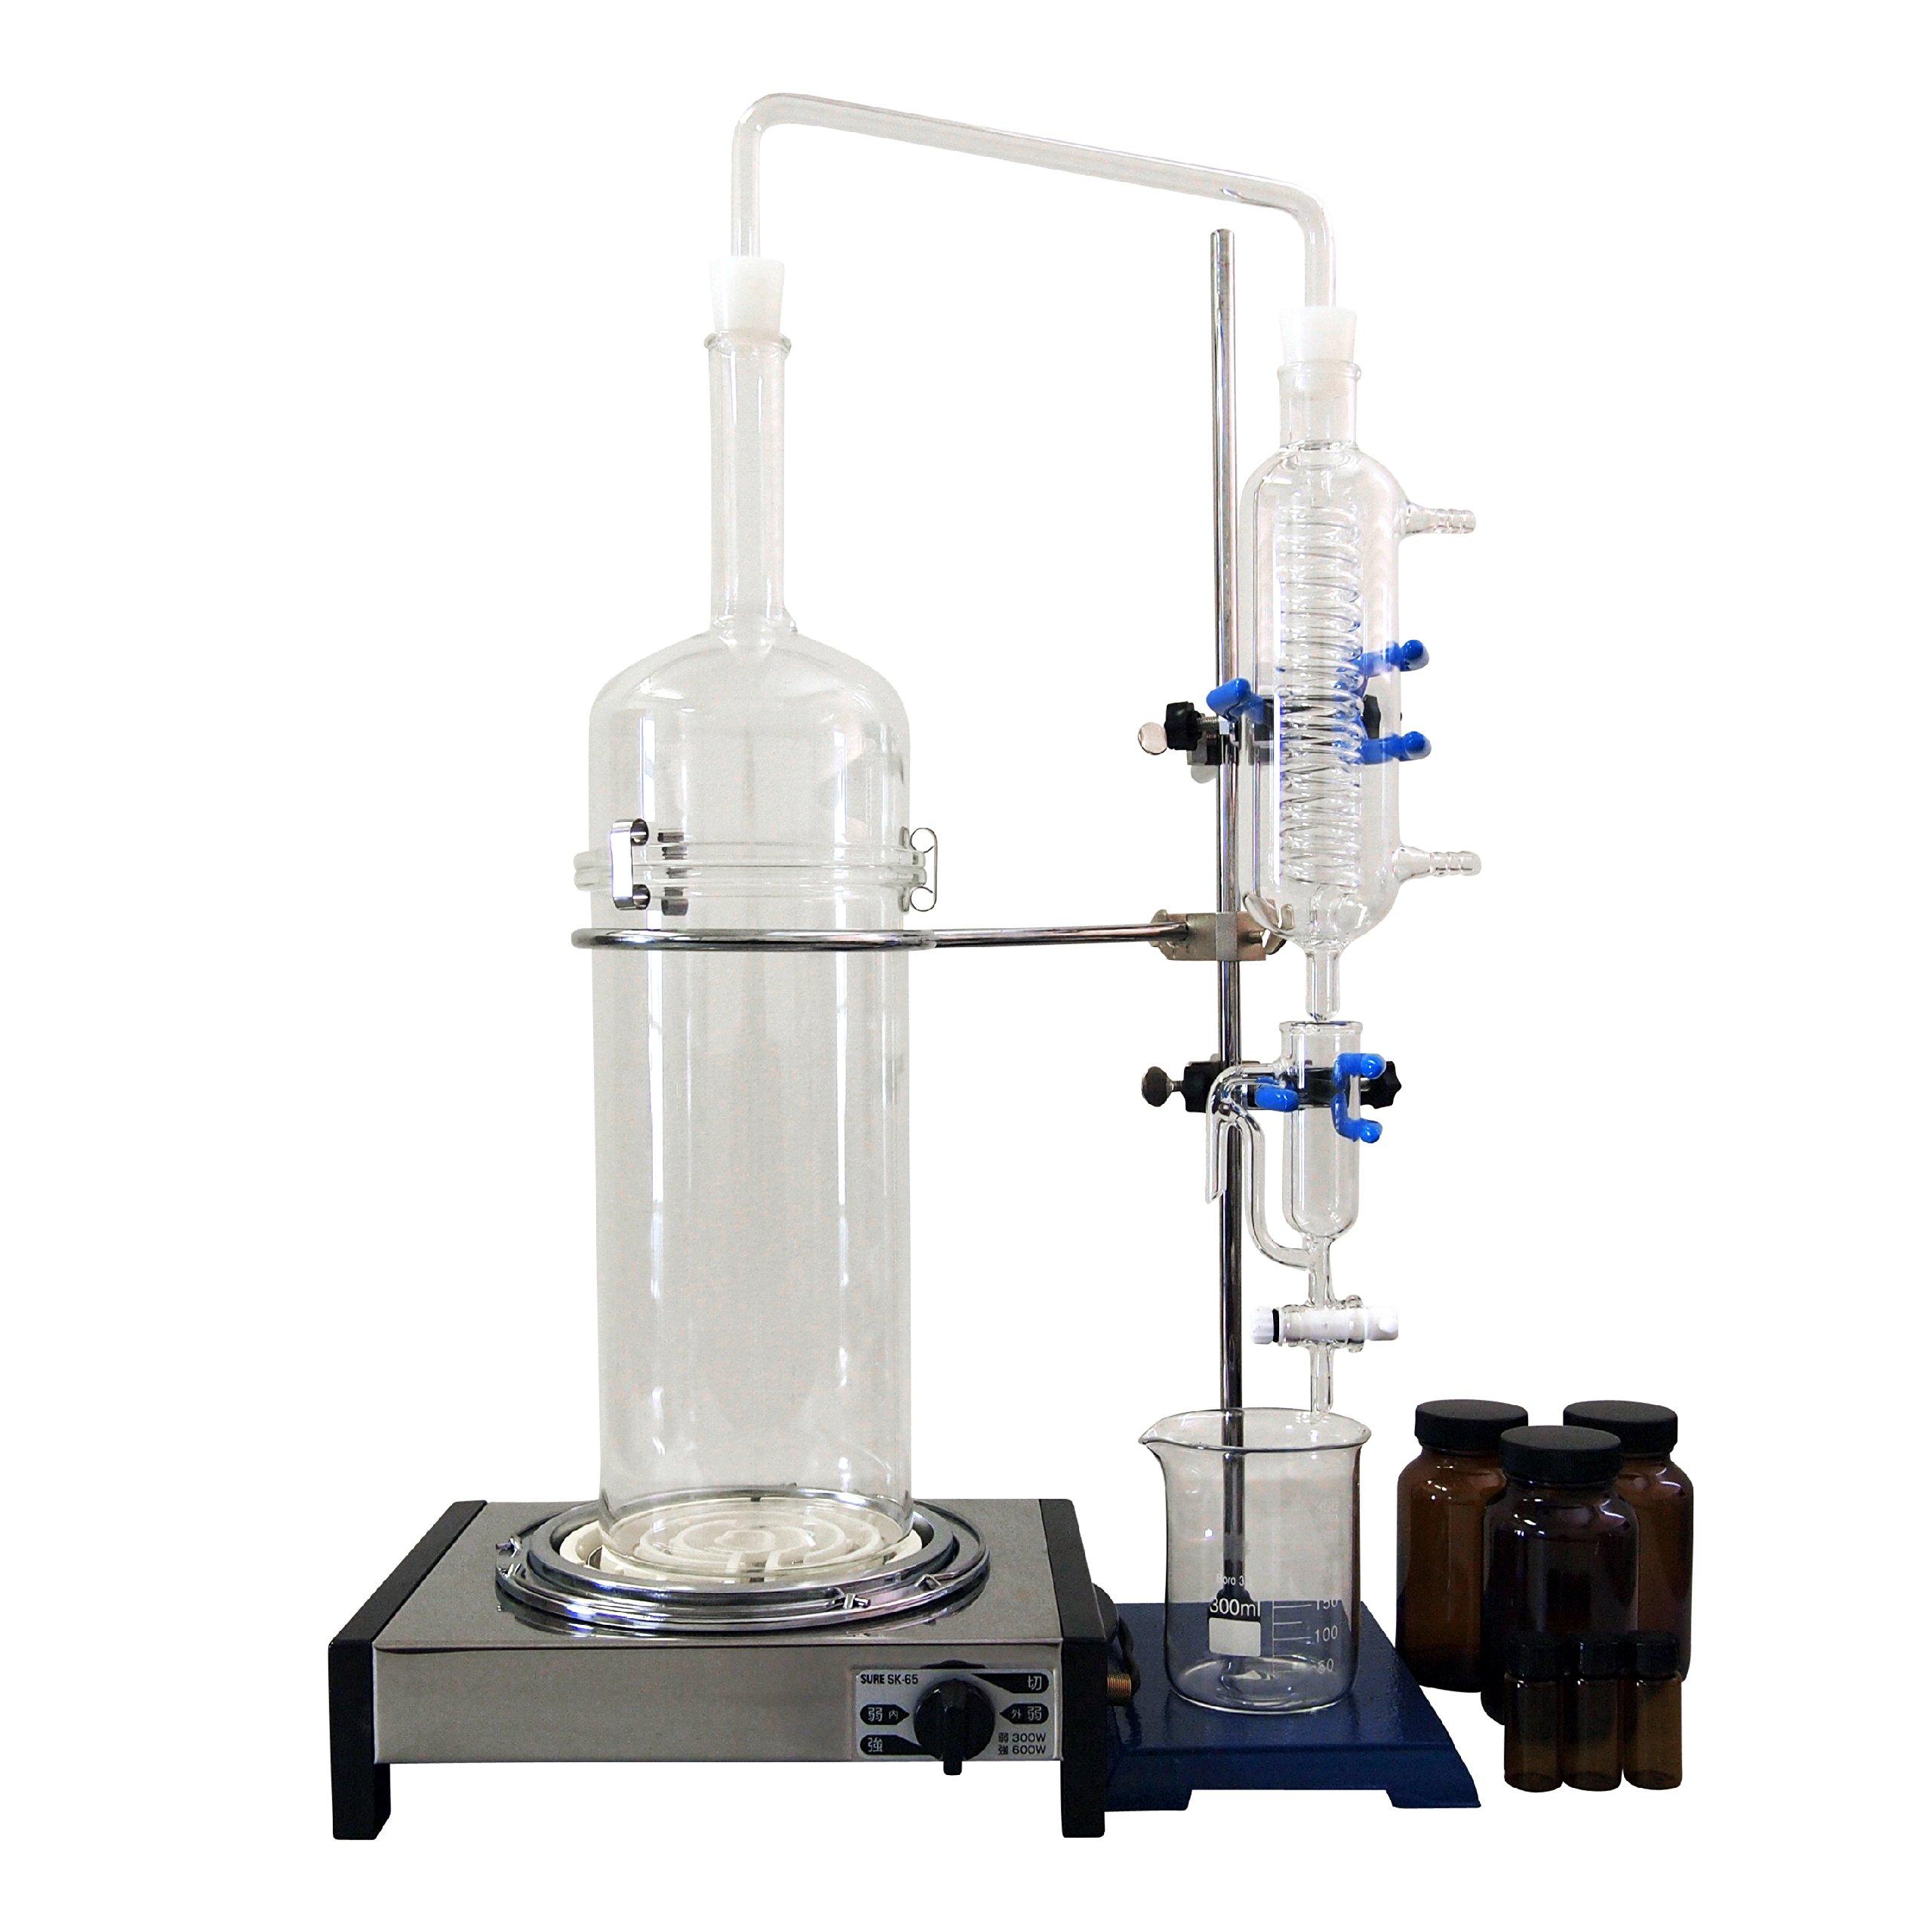 PureStiller Lite Home Distillation Kit